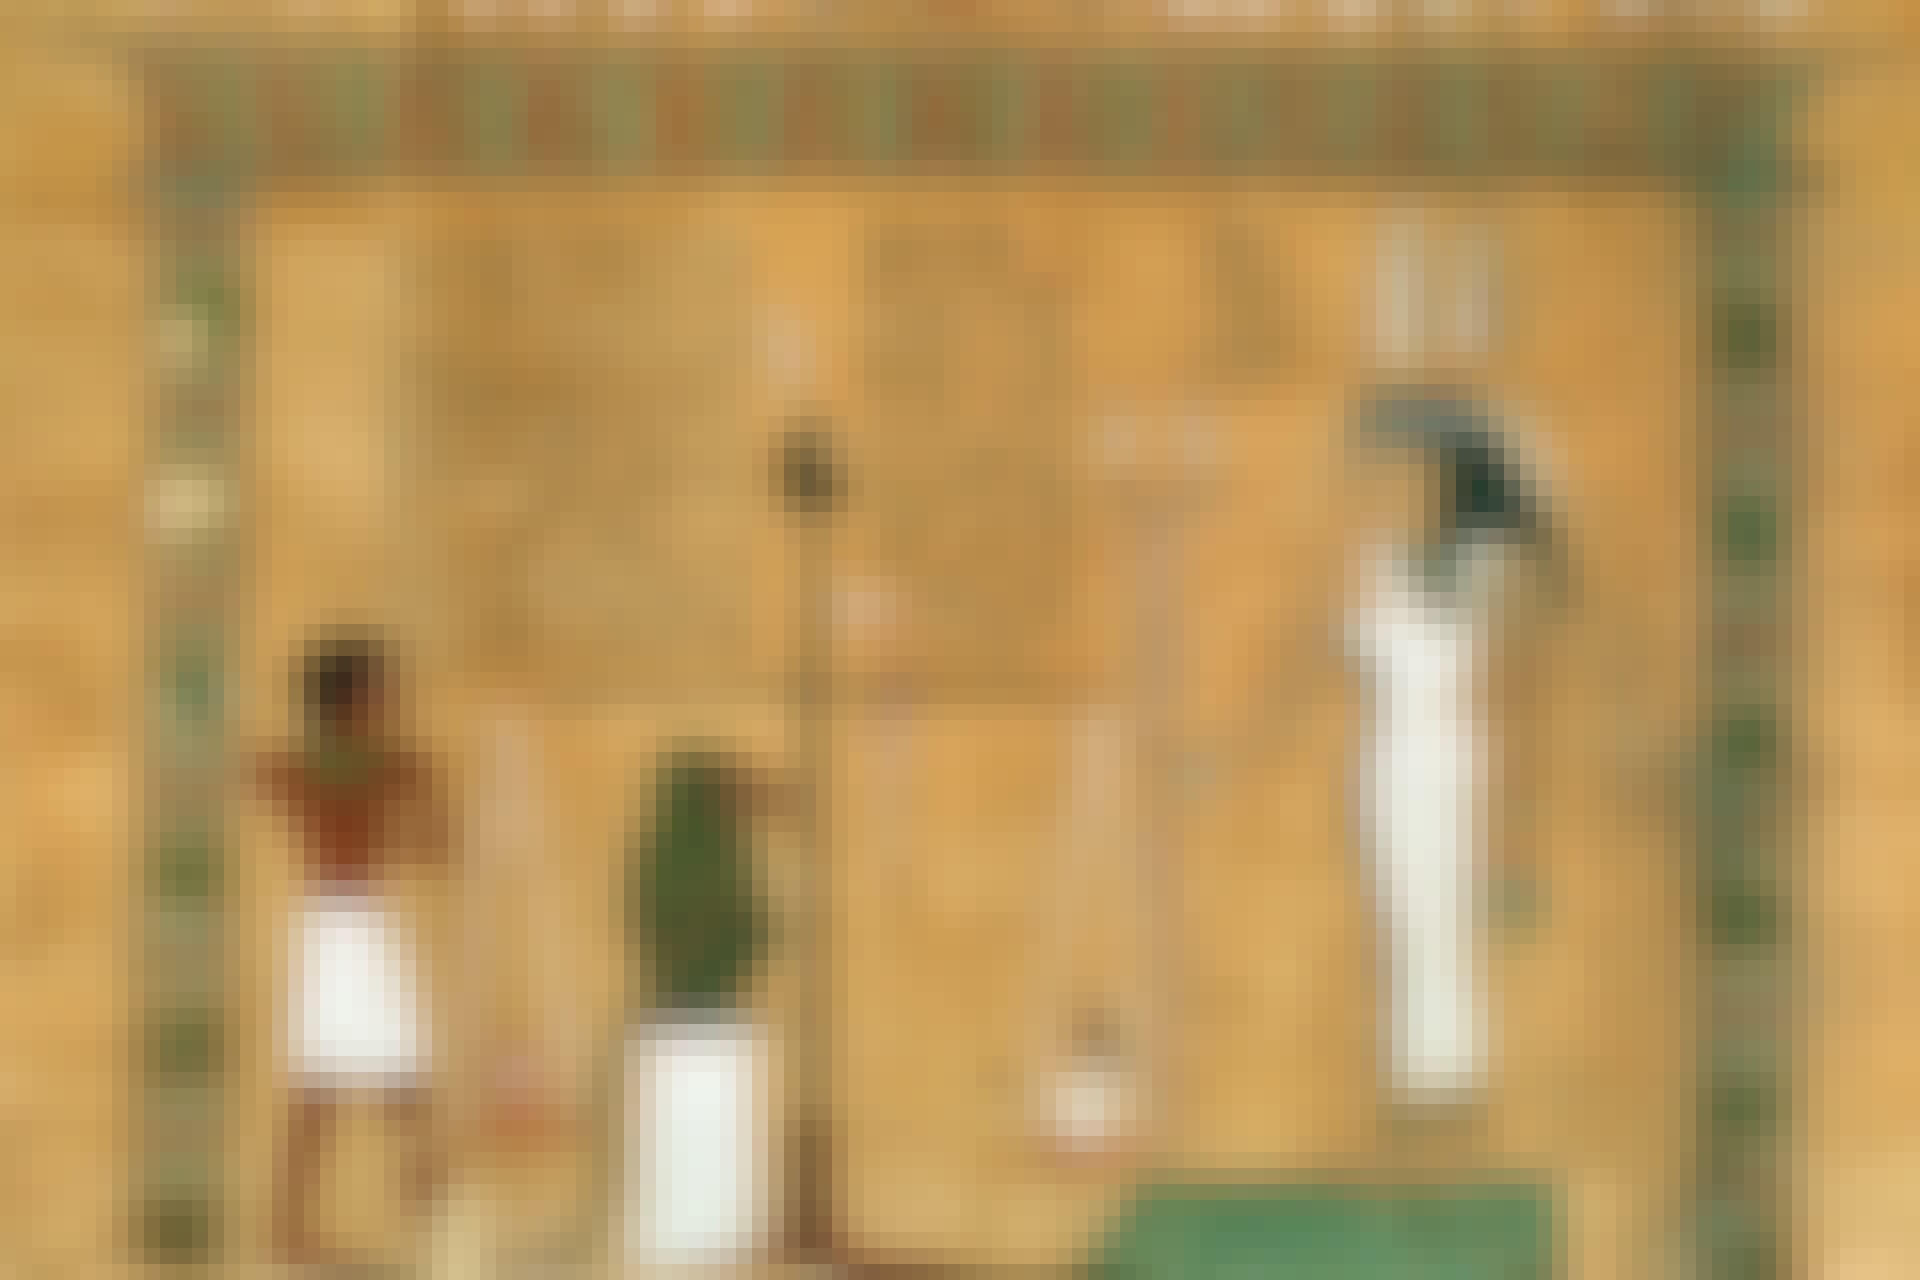 Egyptian scroll